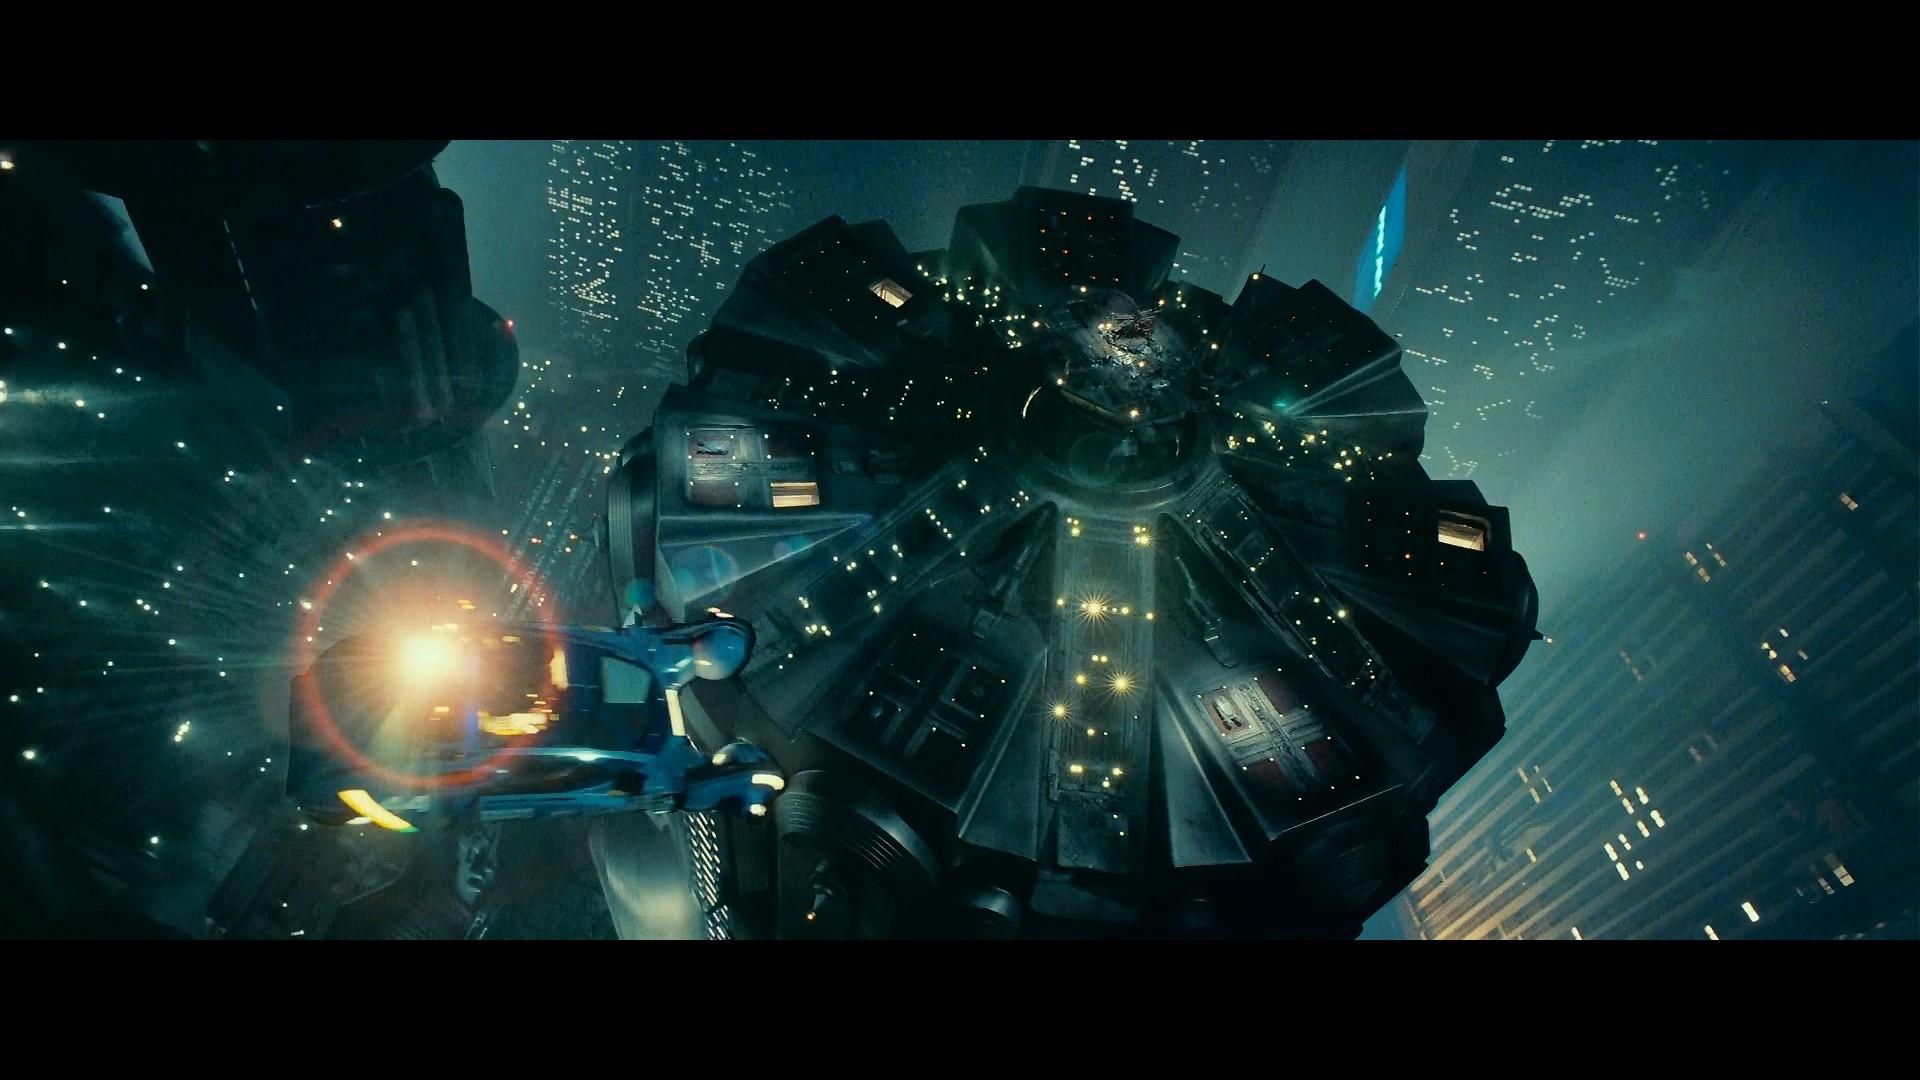 BLADE RUNNER drama sci-Fi thriller action city spaceship fs wallpaper |  | 224088 | WallpaperUP